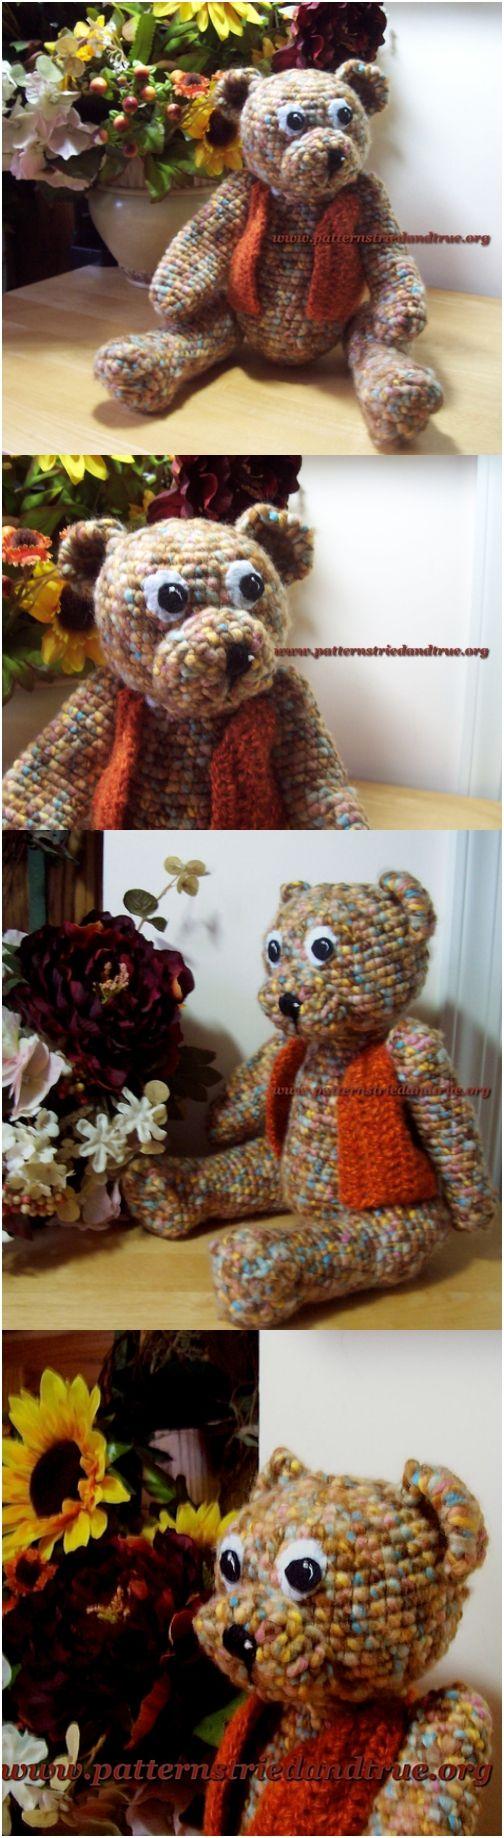 Crochet Jointed Teddy Bear Pattern, Crochet Vest Pattern included, DIY Scrapbooked Digital Instant Download PDF File